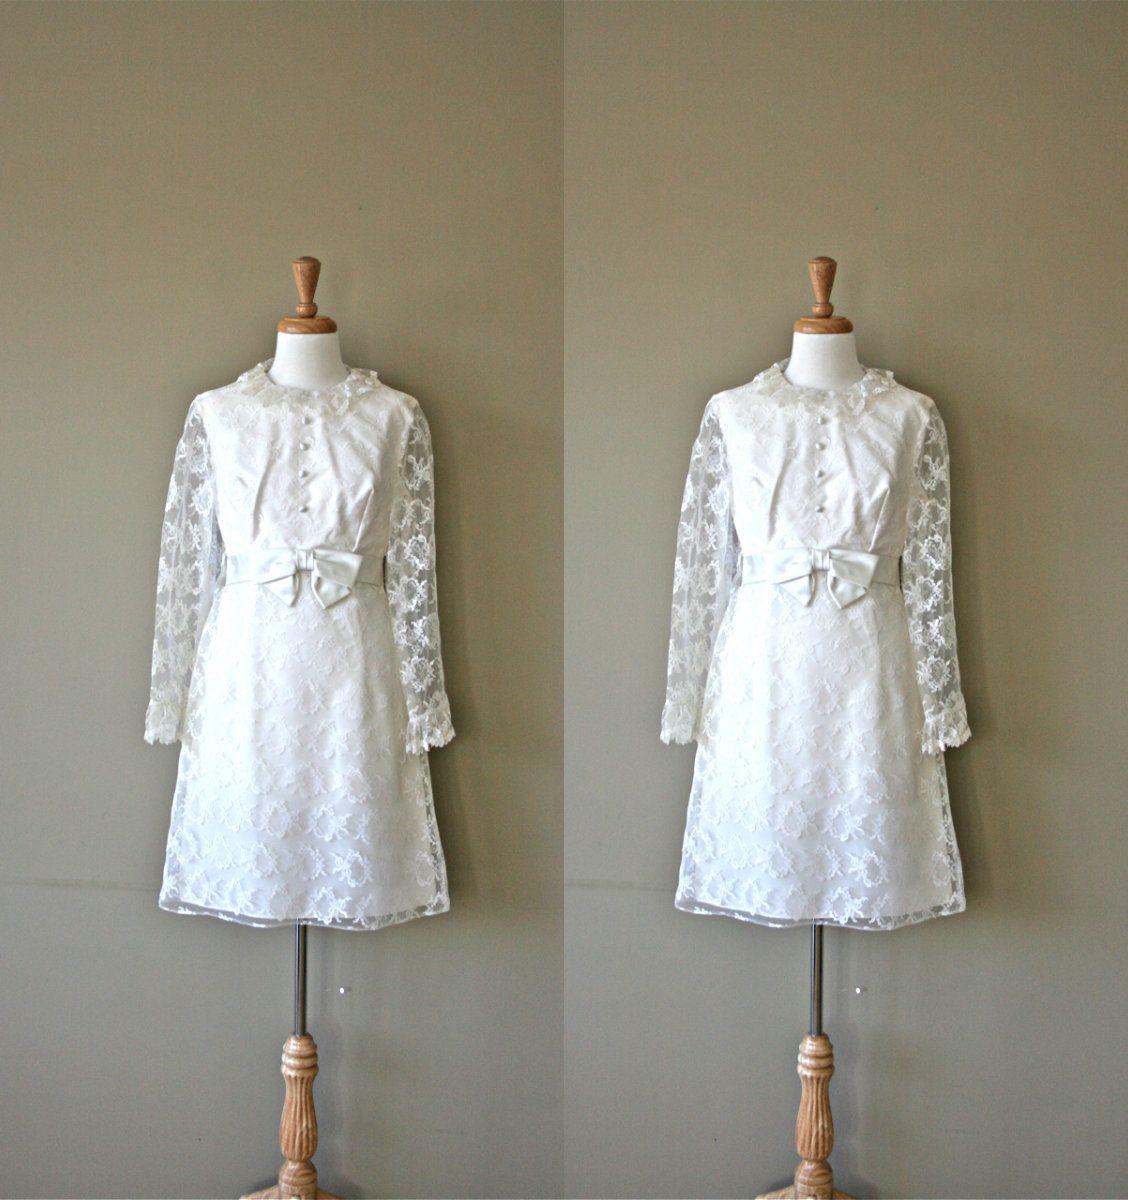 SALE 60s Wedding Dress / 1960s White Lace Shift Dress